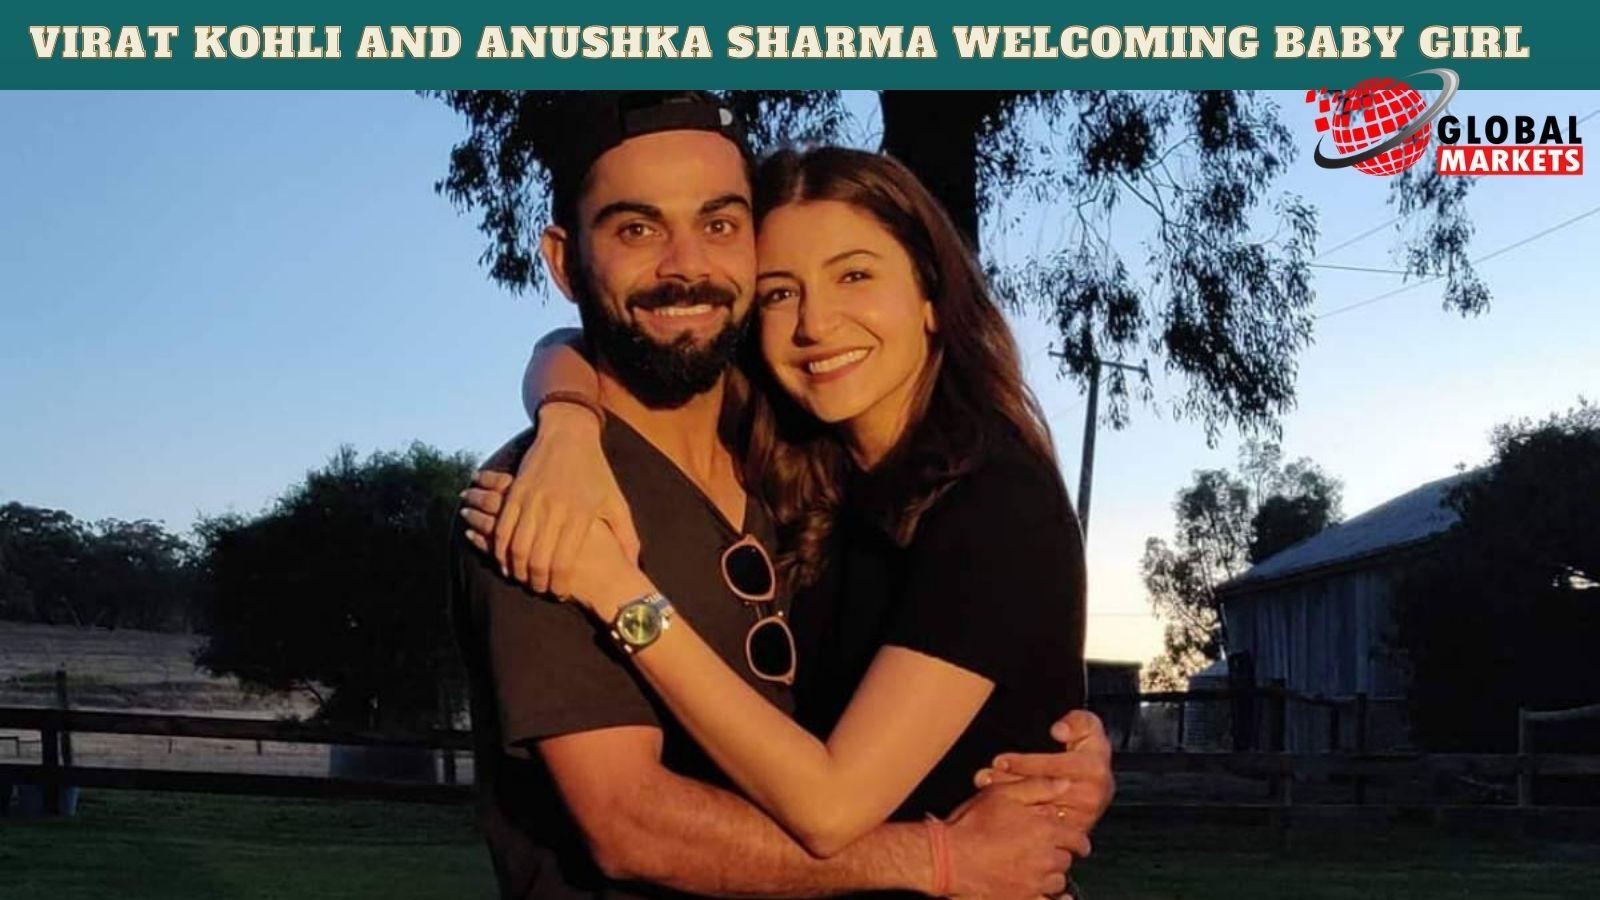 ANUSHKA SHARMA AND VIRAT KOHLI WELCOMING BABY GIRL